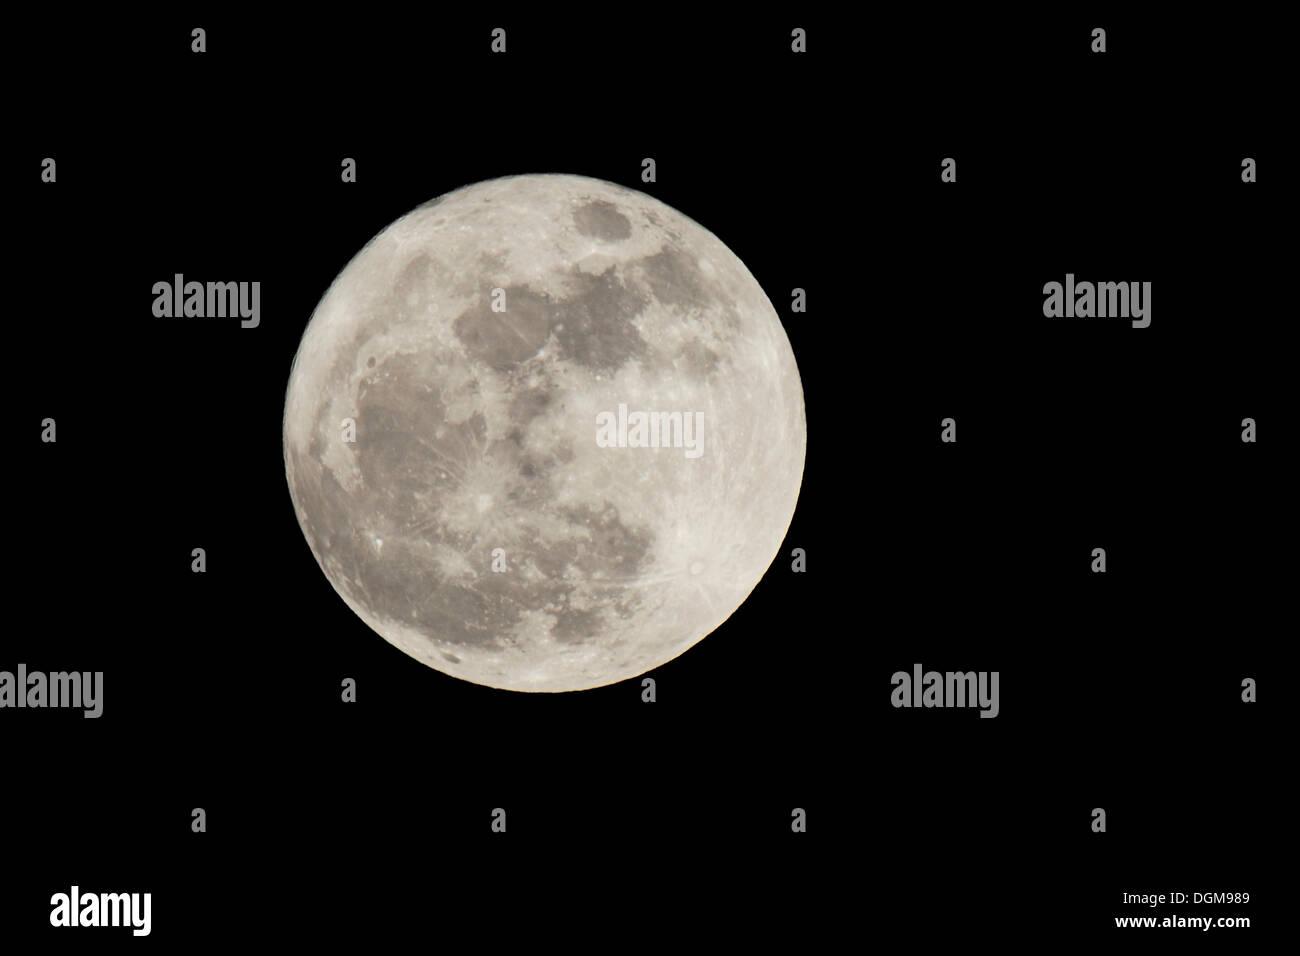 Full moon, northern hemisphere - Stock Image